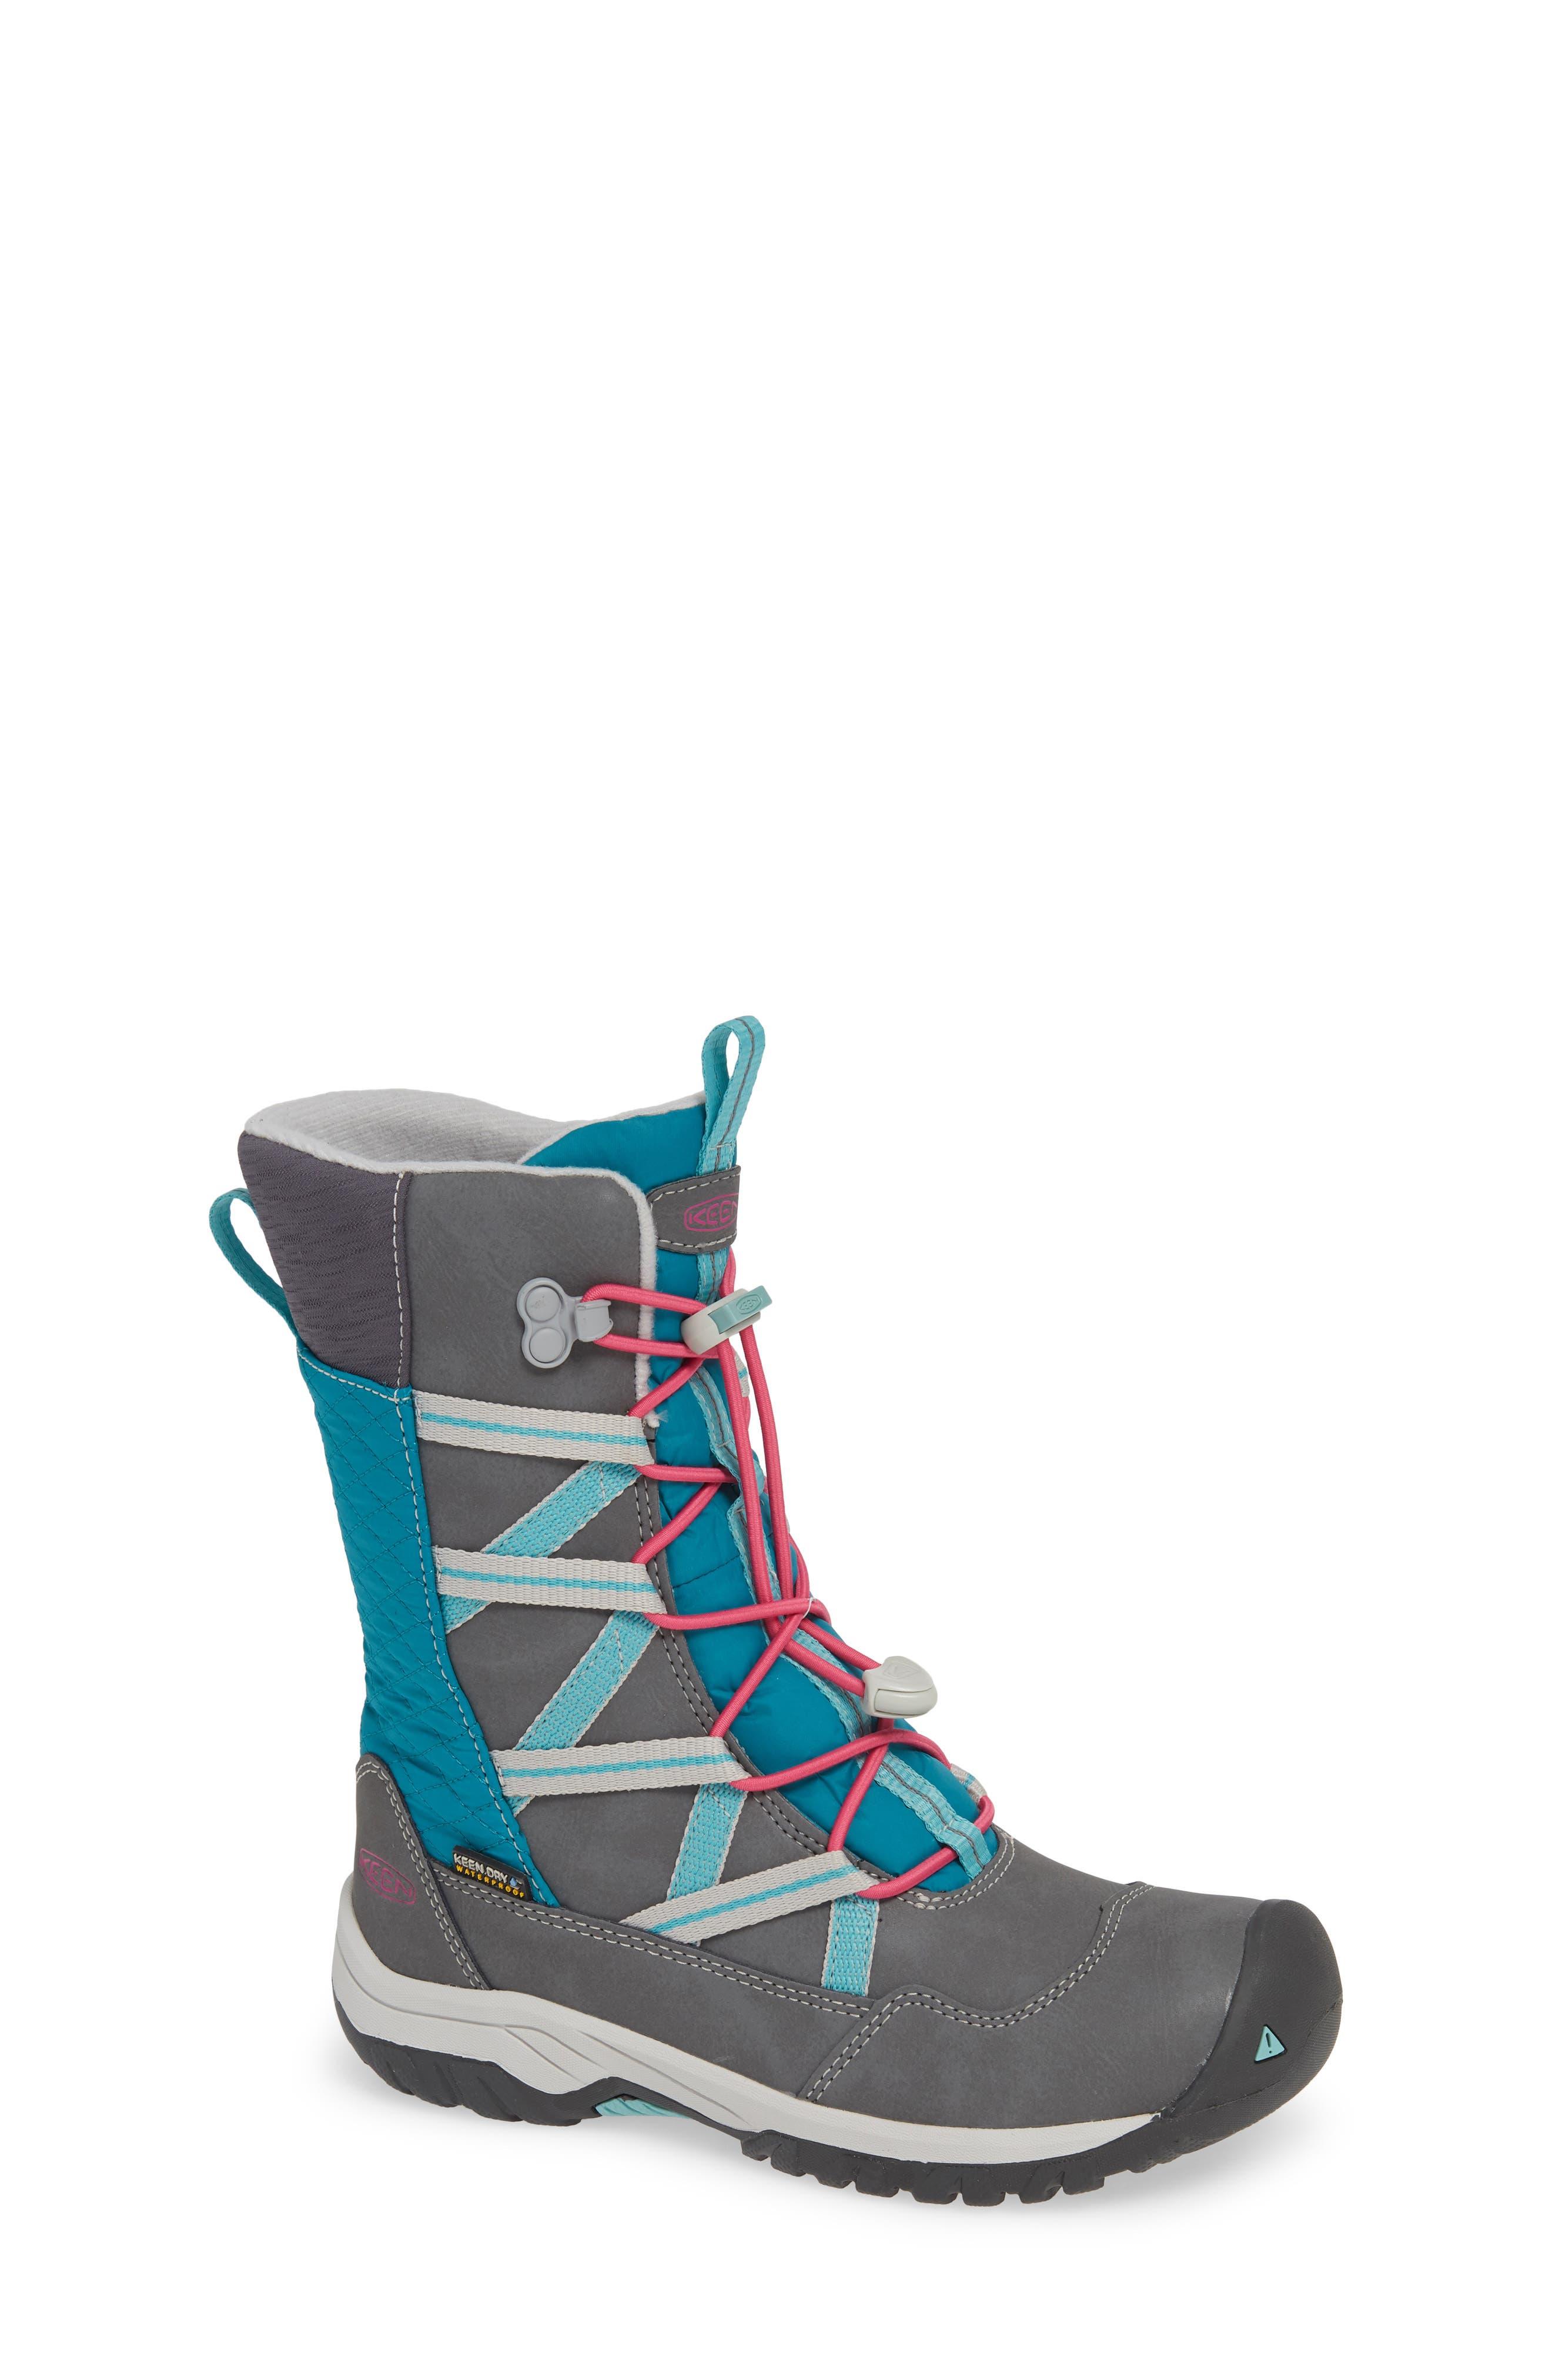 Keen Hoodoo Waterproof Snow Boot